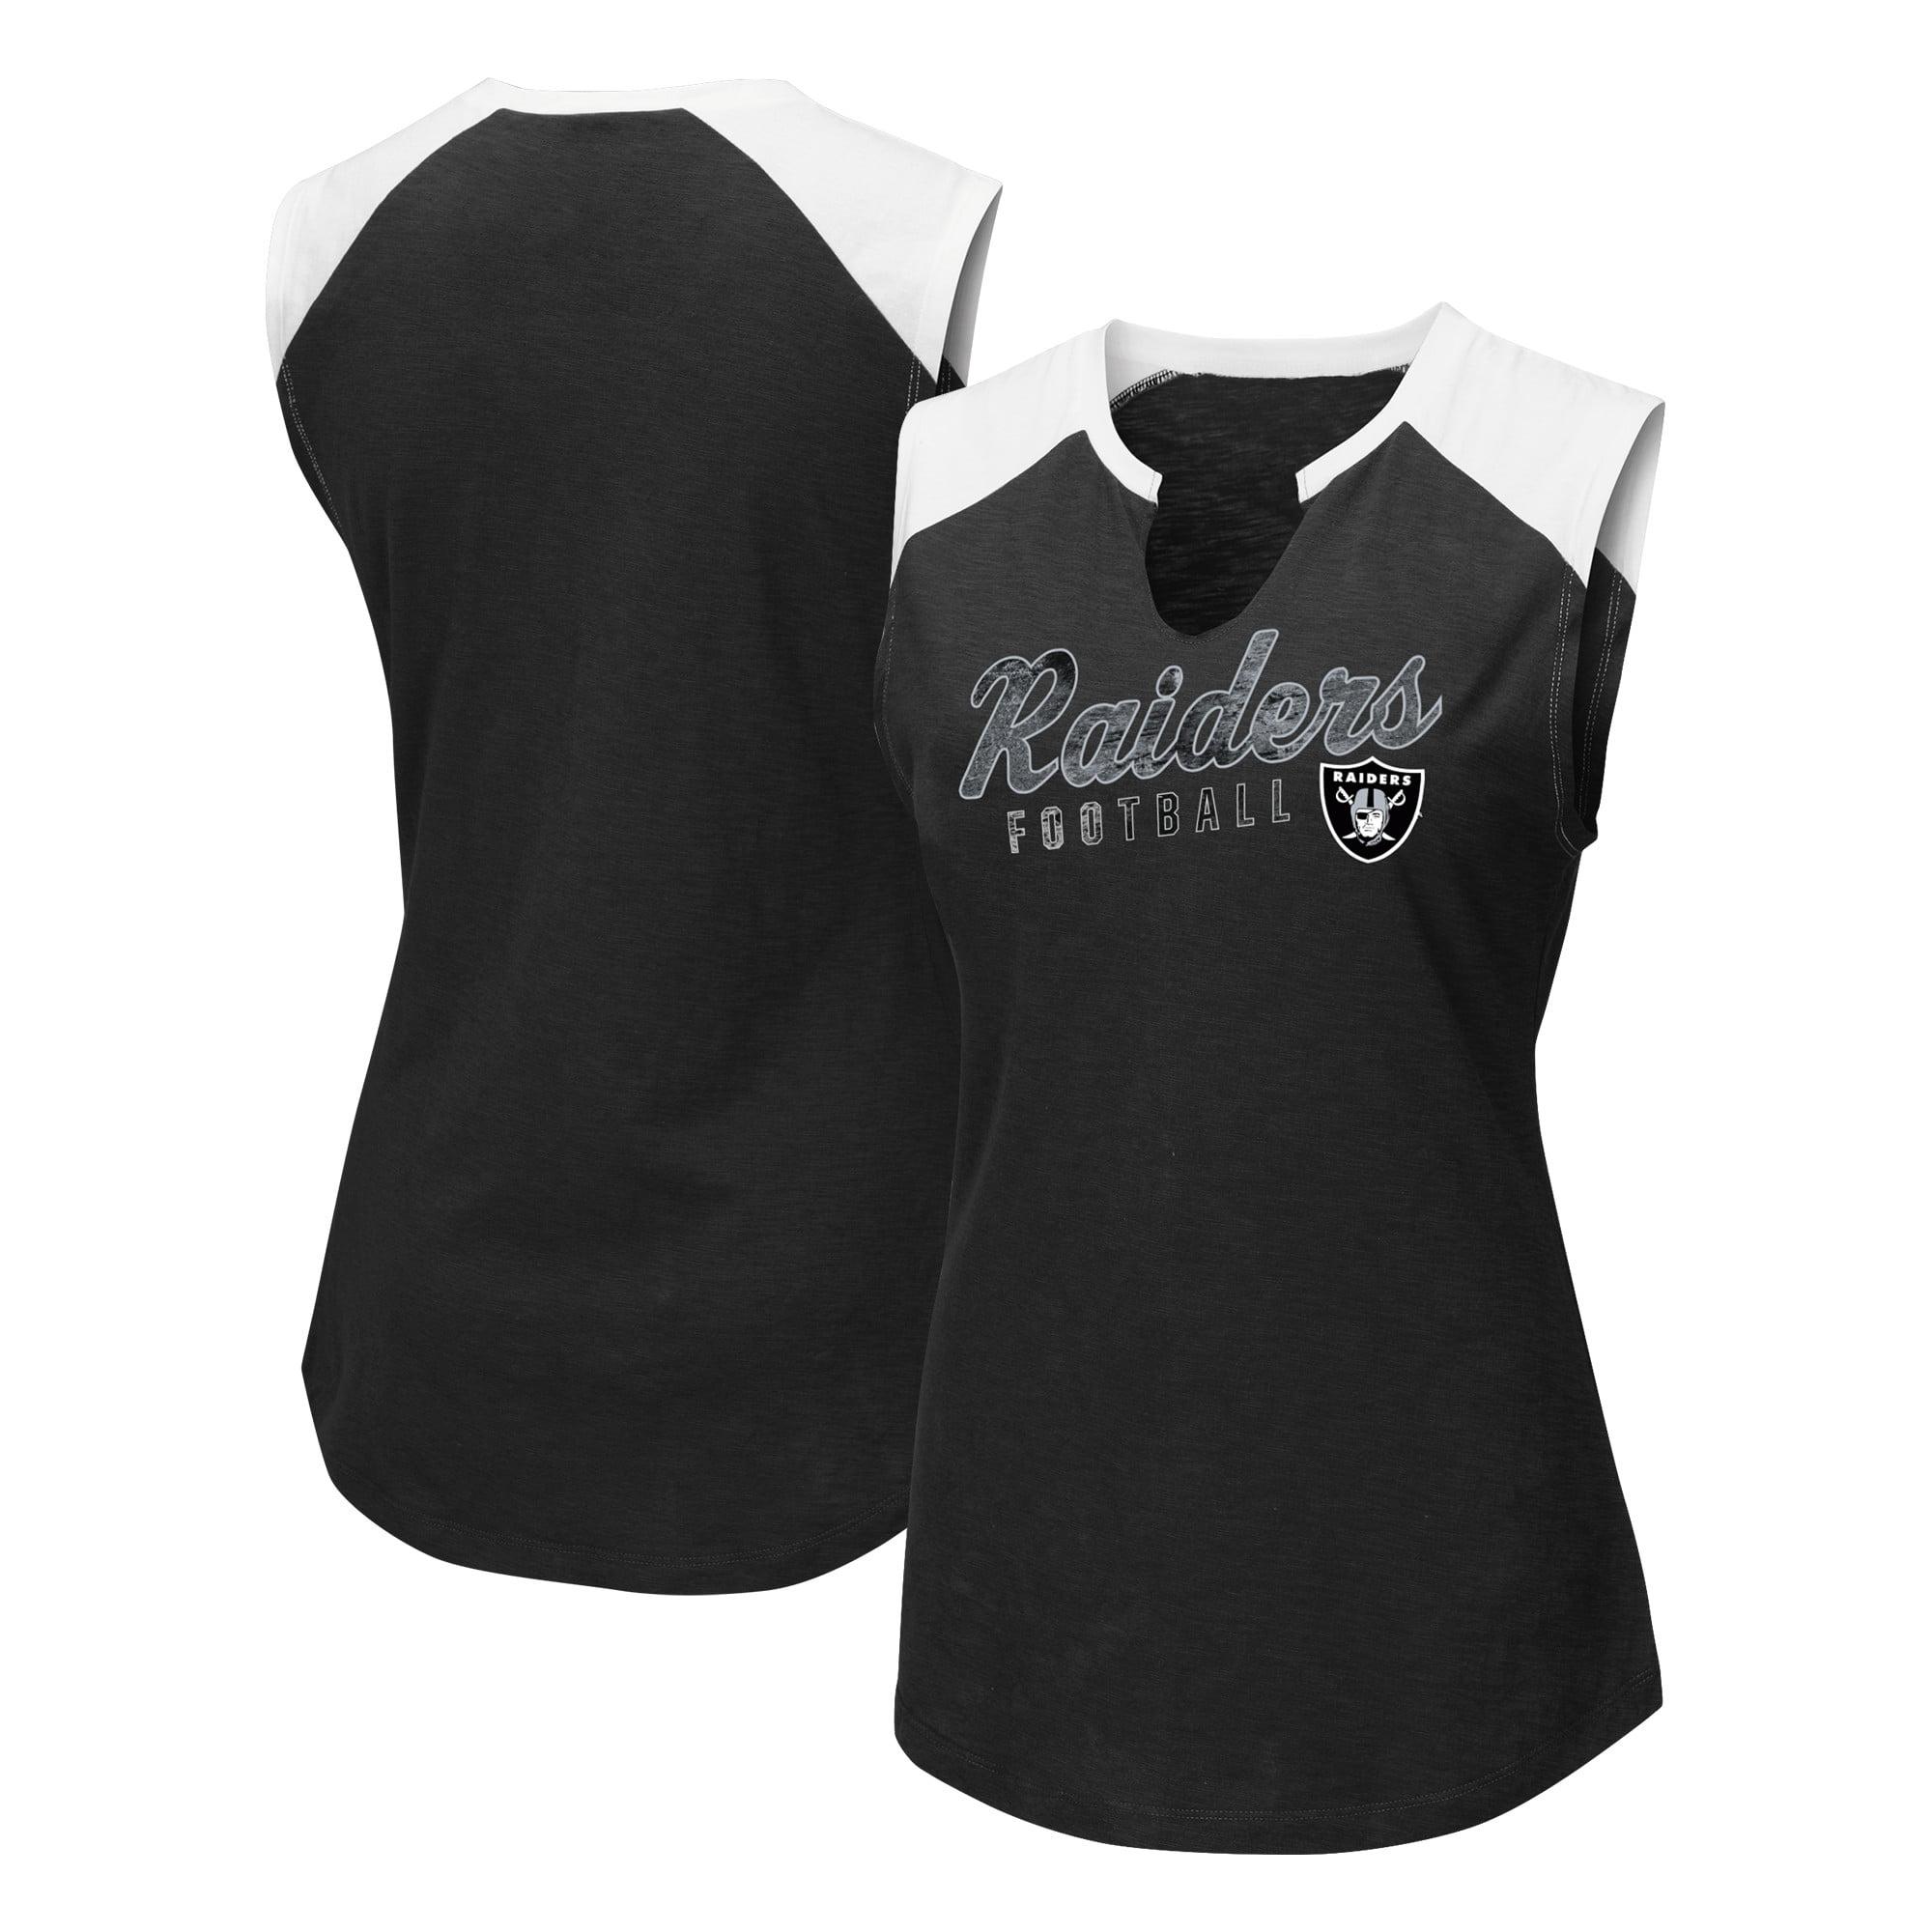 Oakland Raiders Majestic Women's V-Notch Muscle Tank Top - Black/White